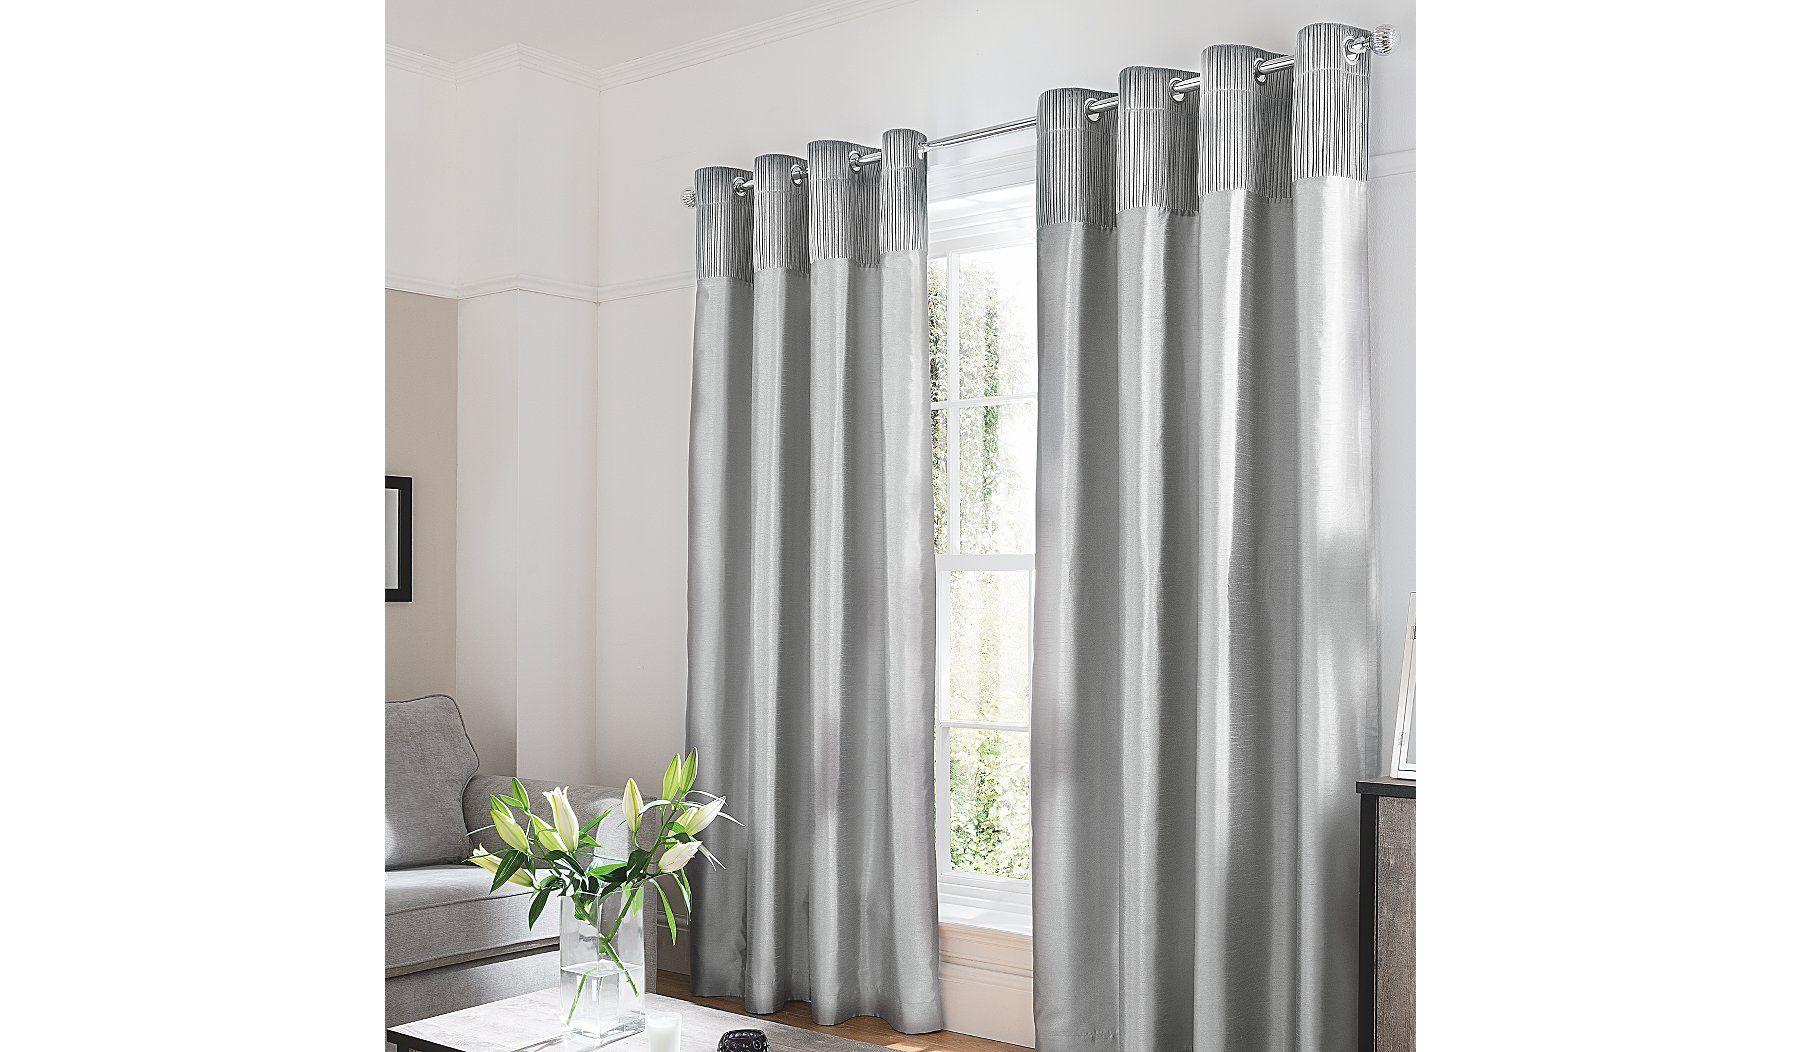 5054070885925 1800 1052 Silk Curtains Faux Silk Curtains Curtains